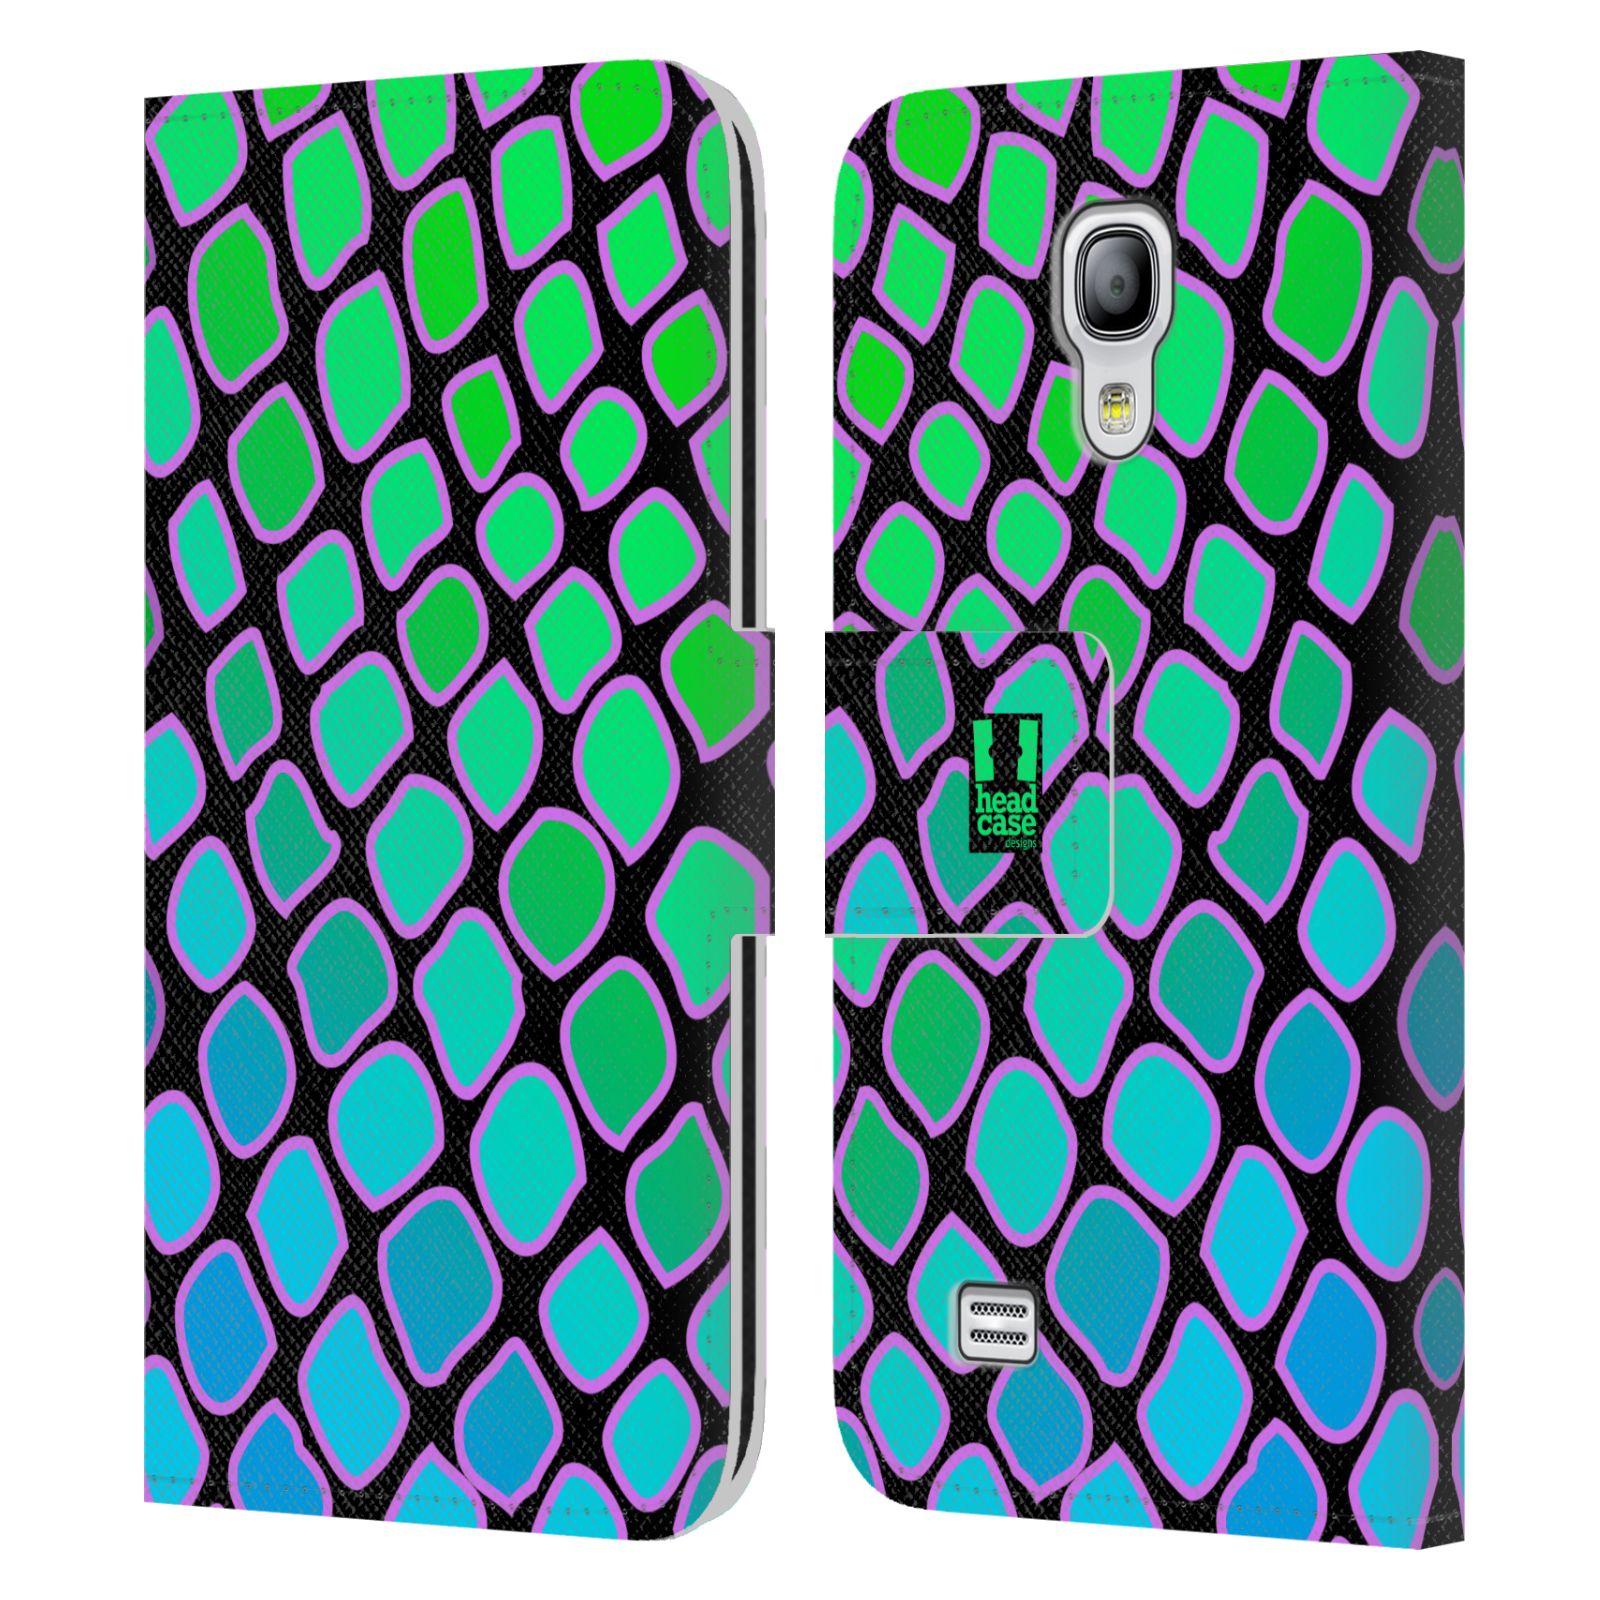 HEAD CASE Flipové pouzdro pro mobil Samsung Galaxy S4 MINI / S4 MINI DUOS Zvířecí barevné vzory vodní had modrá a zelená barva AQUA